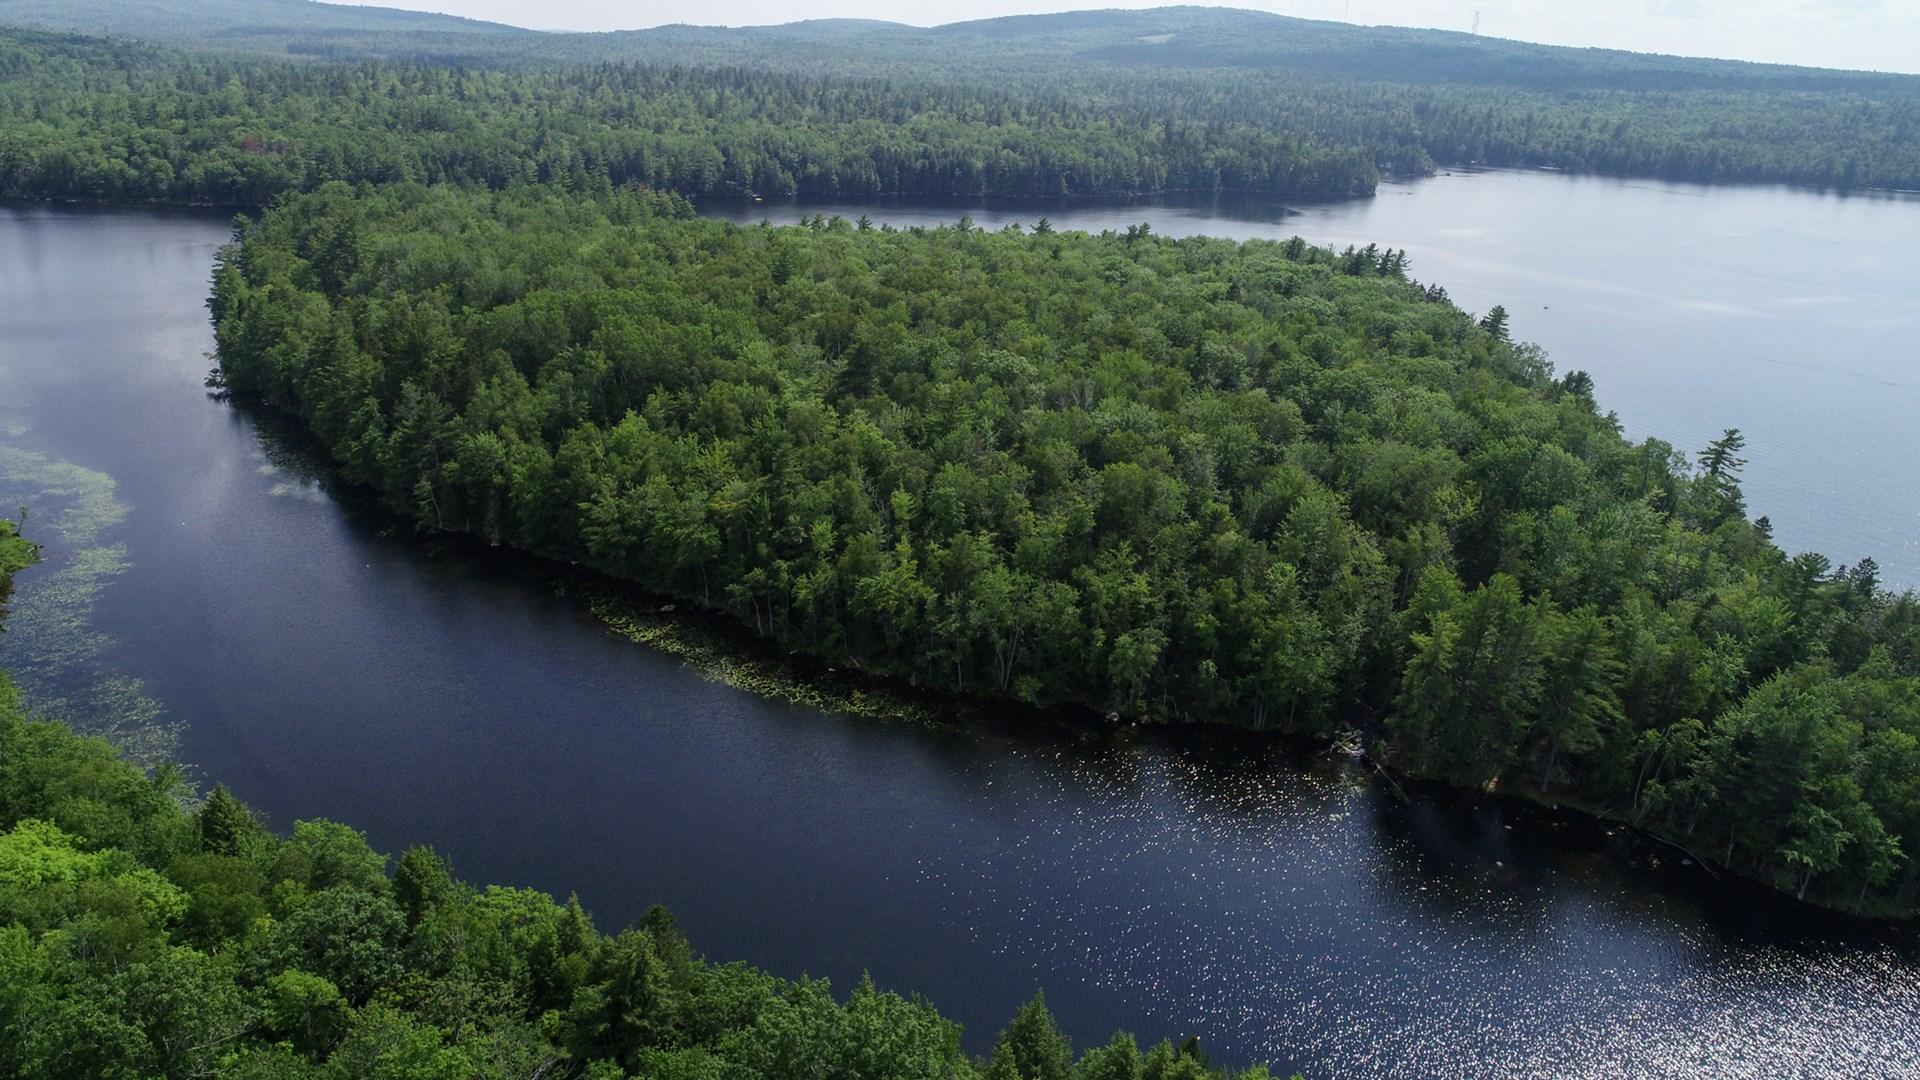 Land for sale in Bucksport, Maine